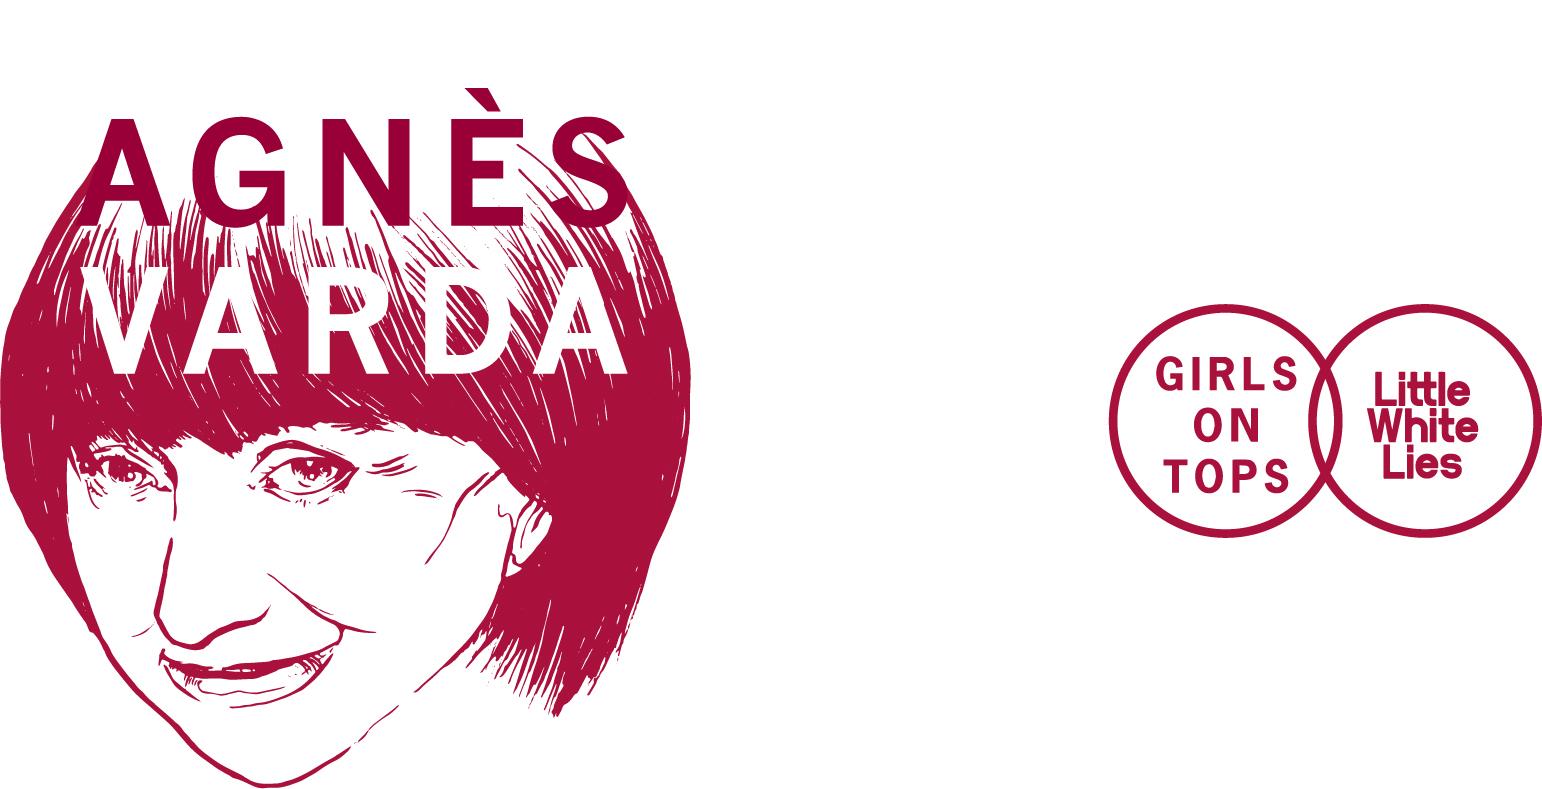 vardatypeoutlines+logos.jpg